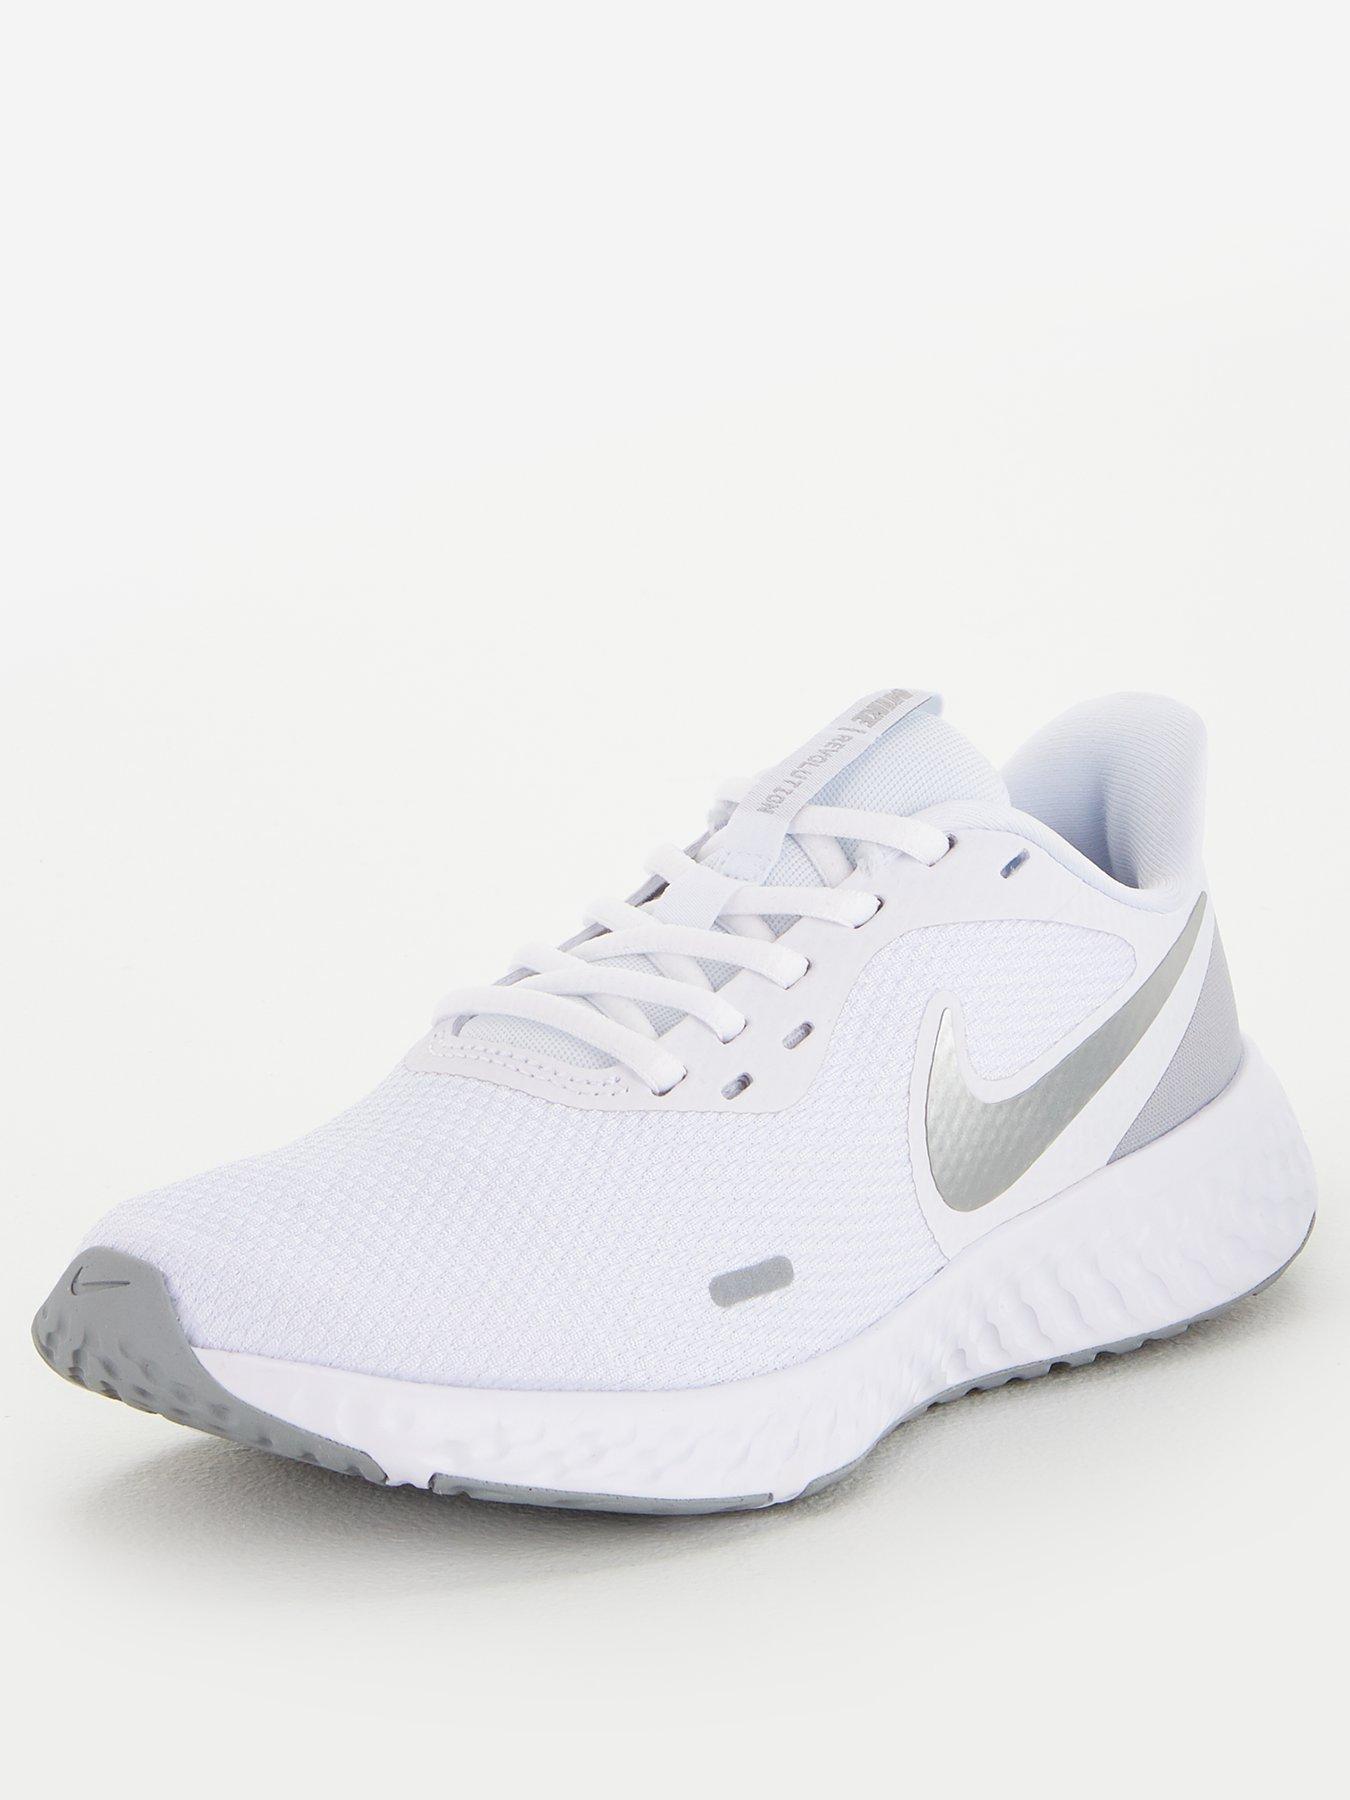 nike running shoes womens uk